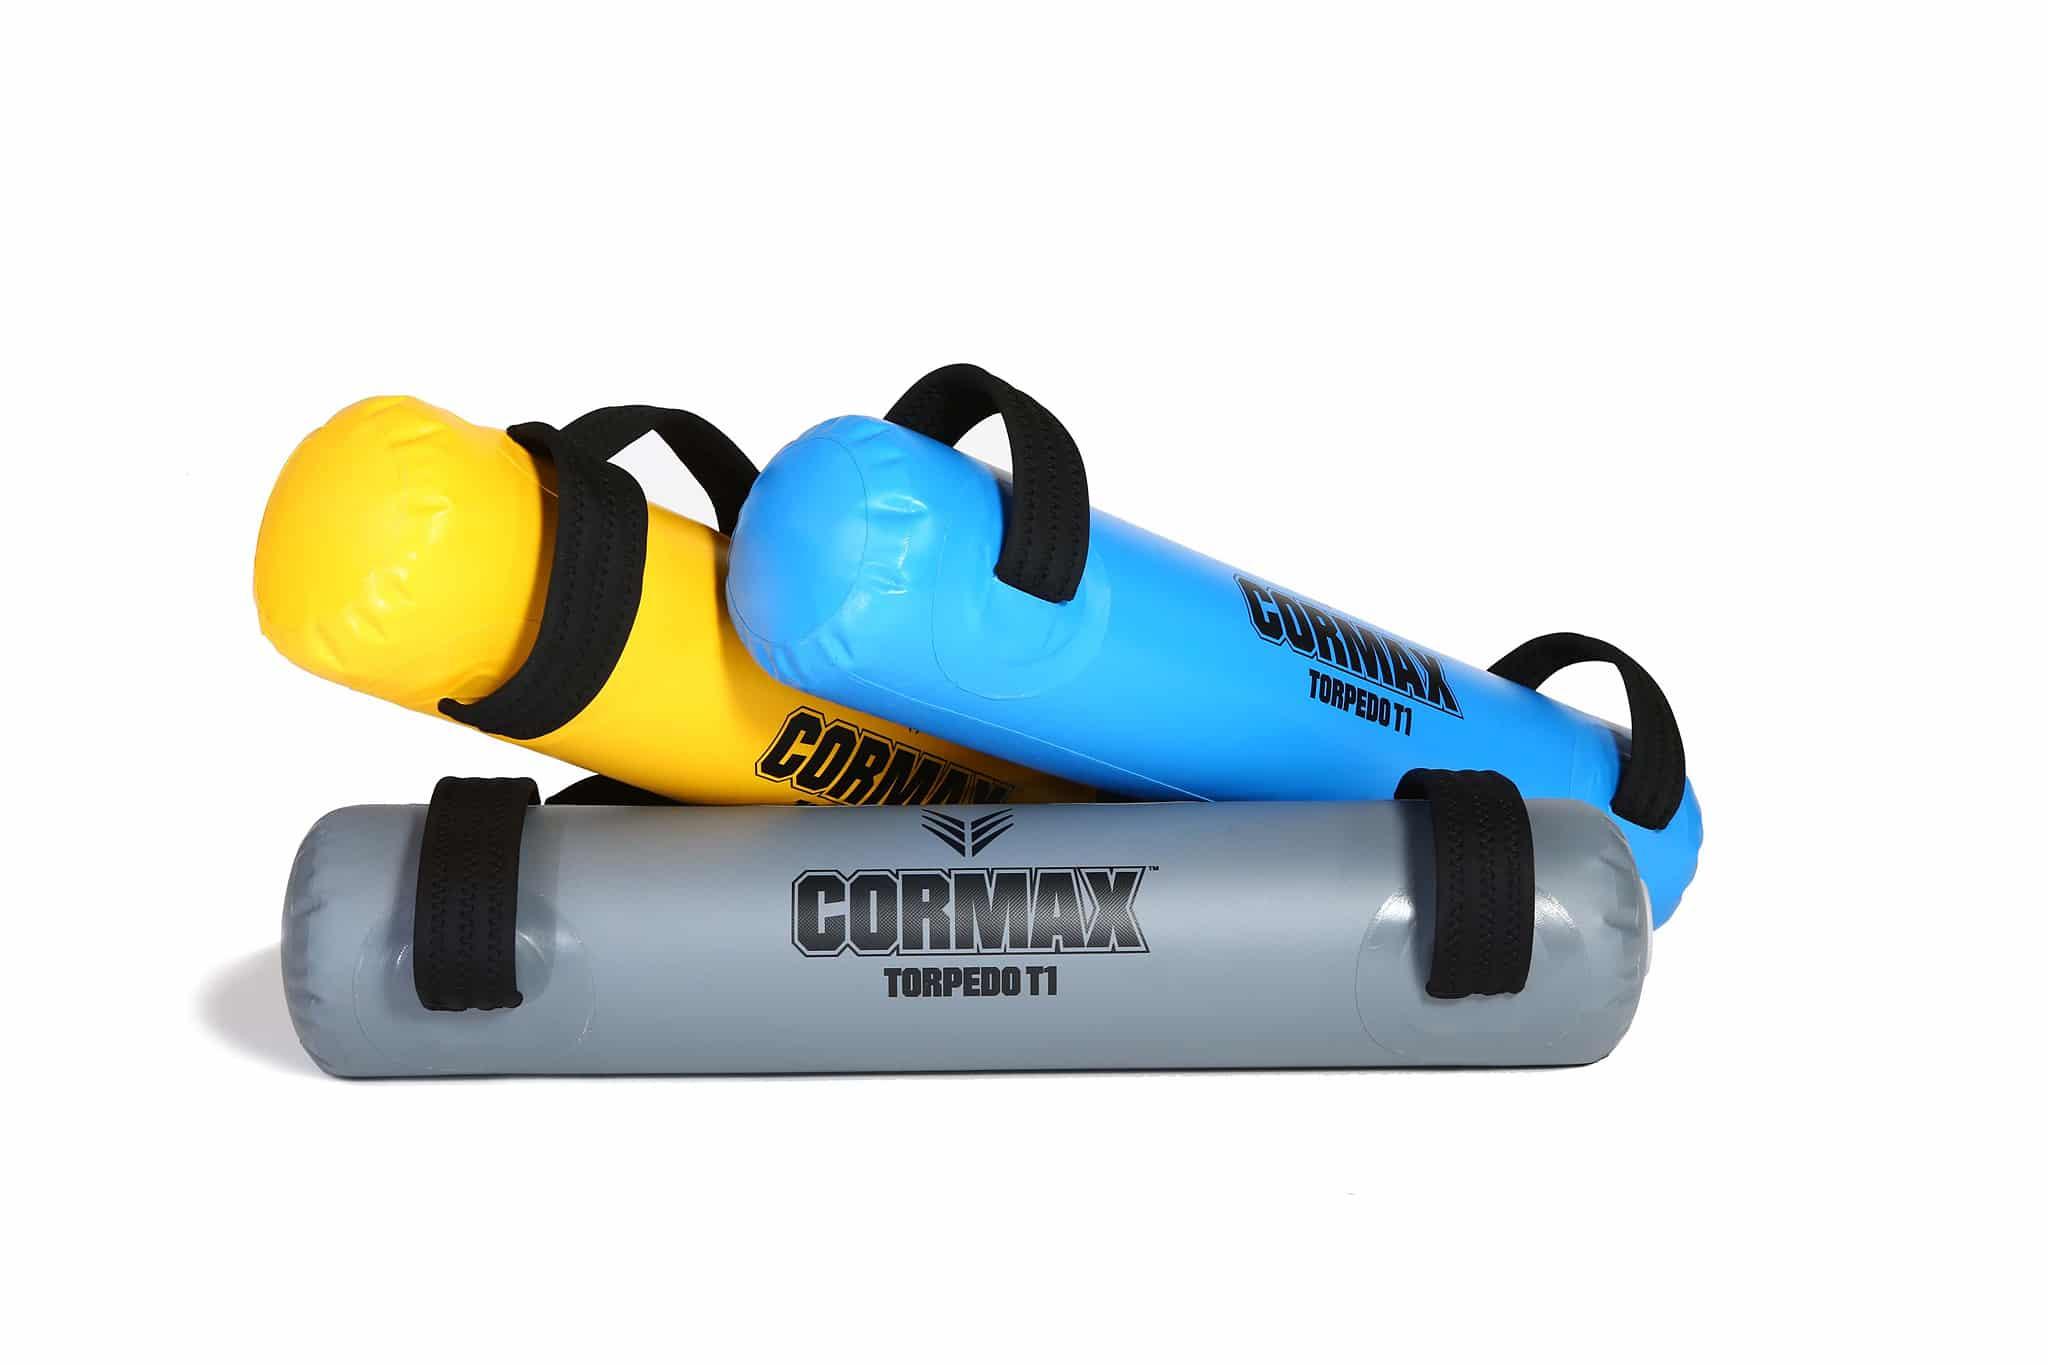 Cormax-Fitness-Torpedo 1-Group